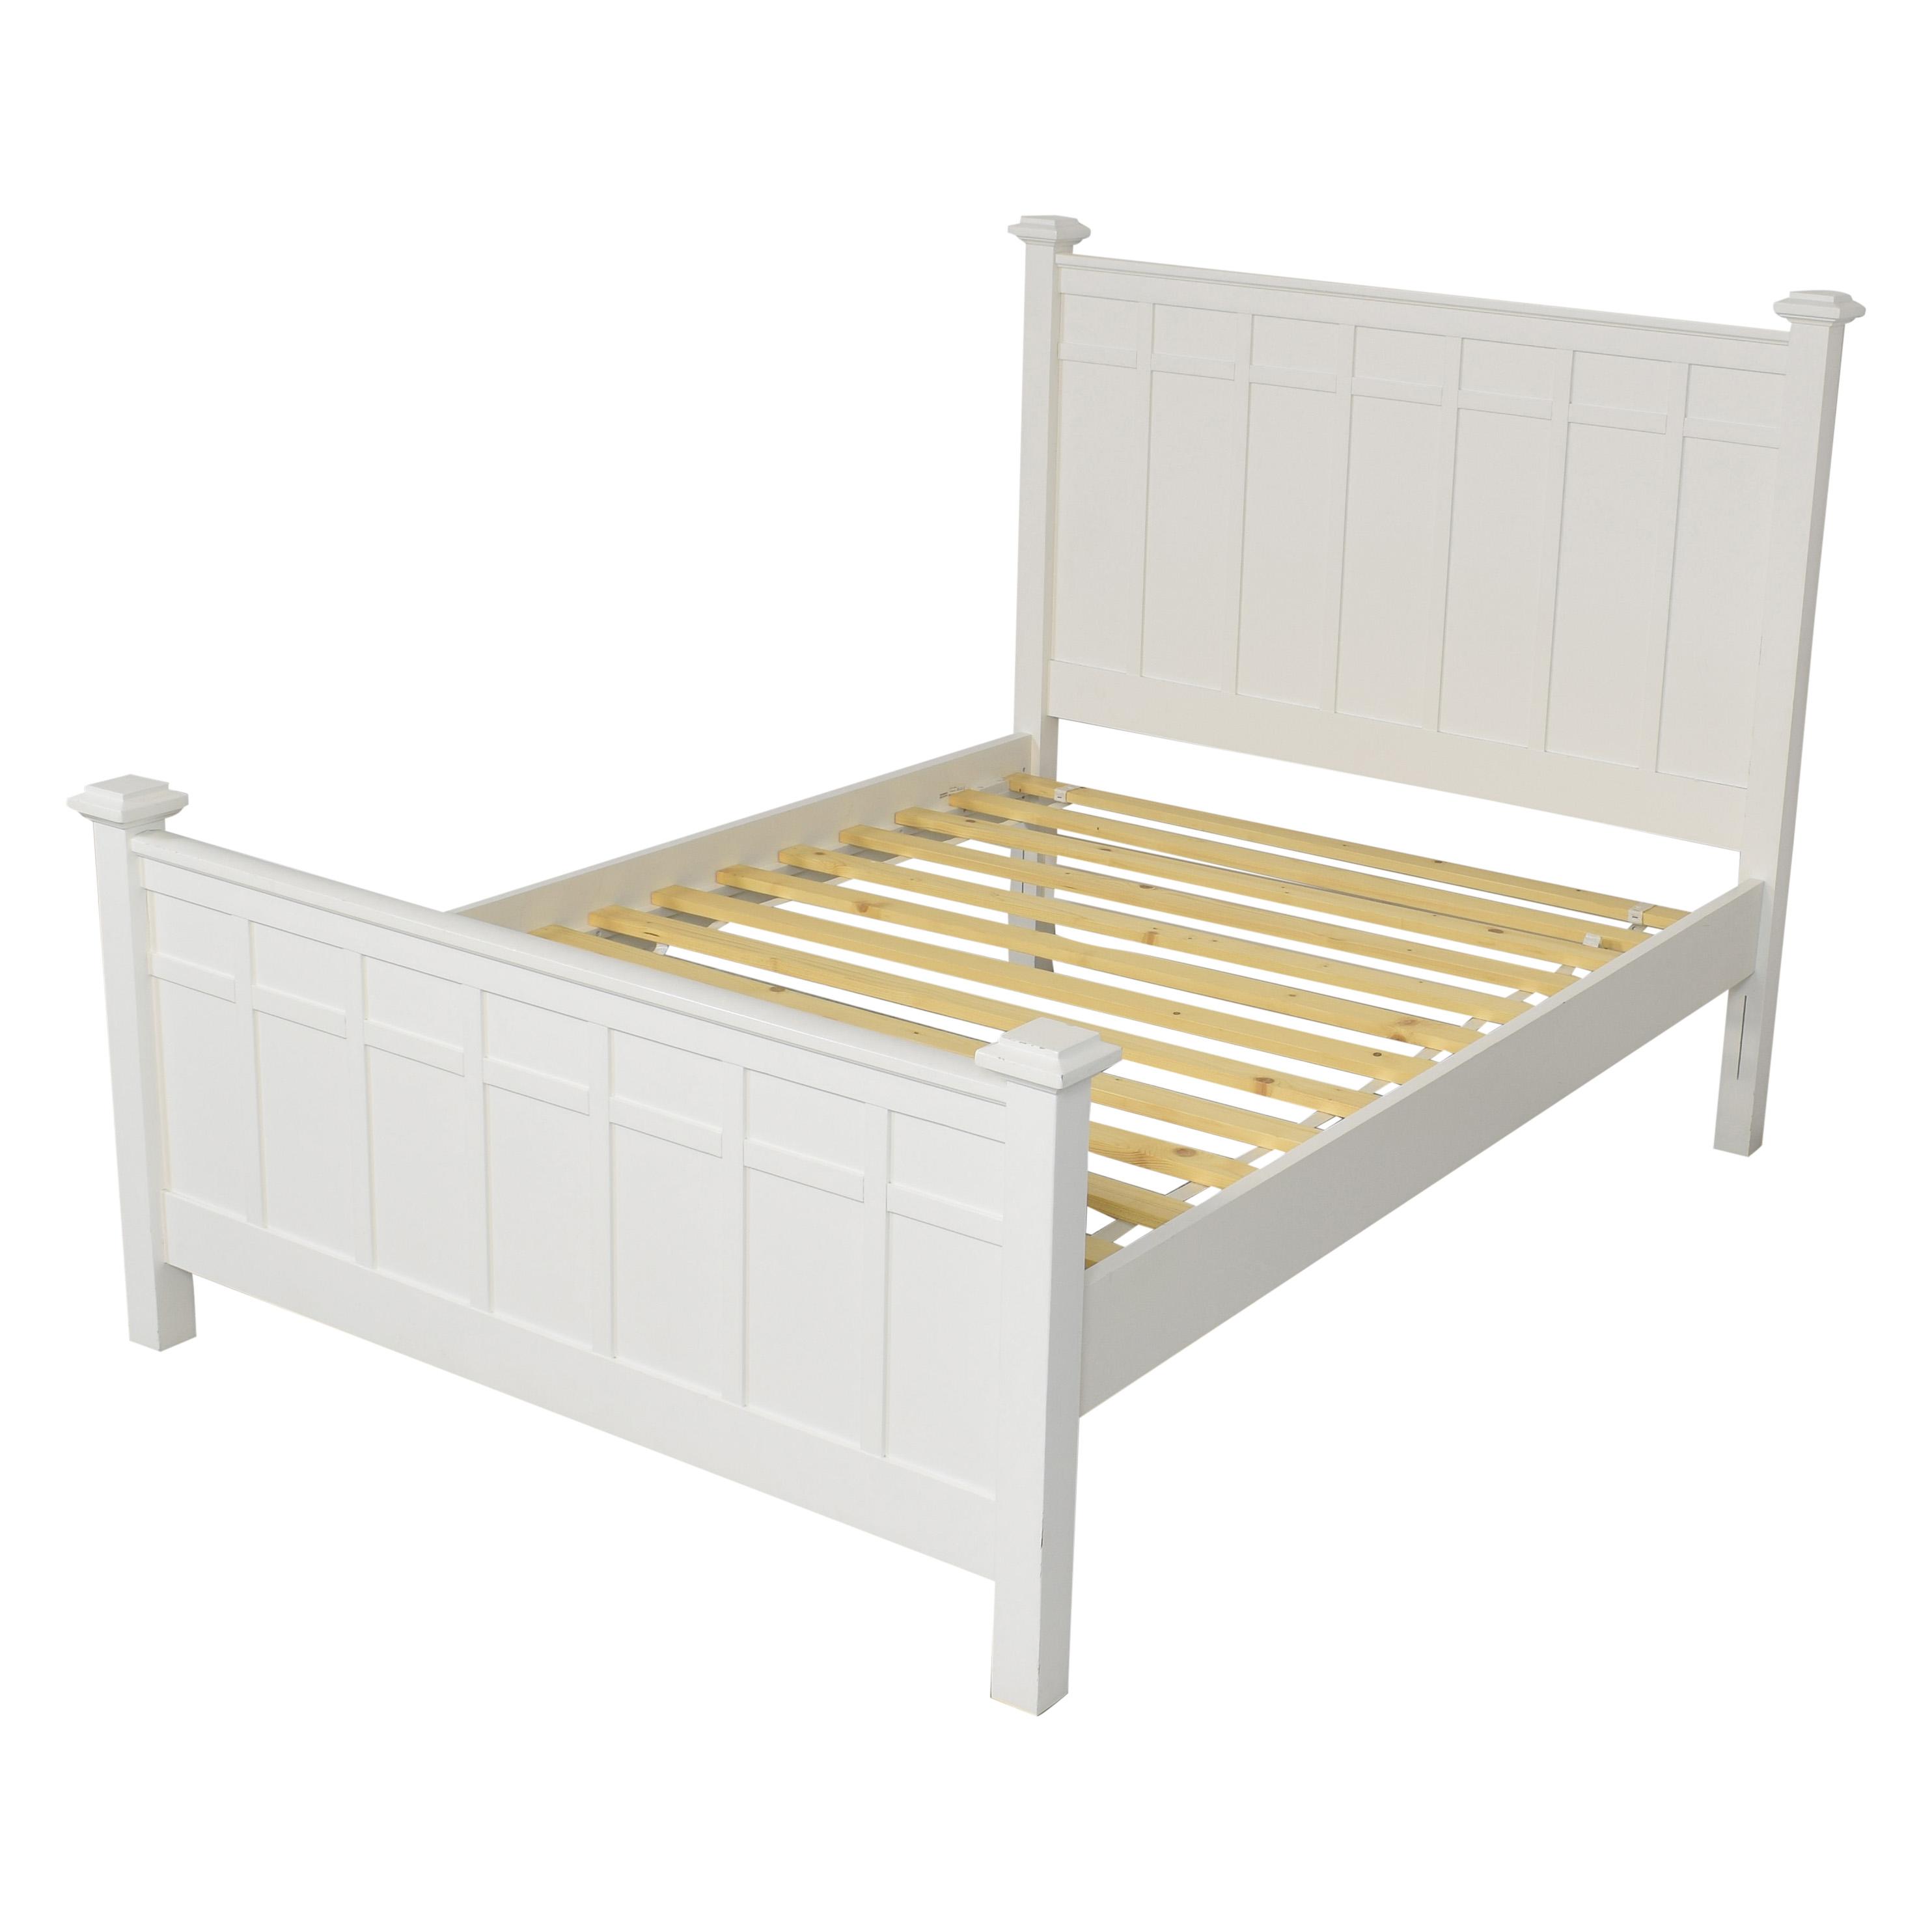 Crate & Barrel Crate & Barrel Full Bed Frame price